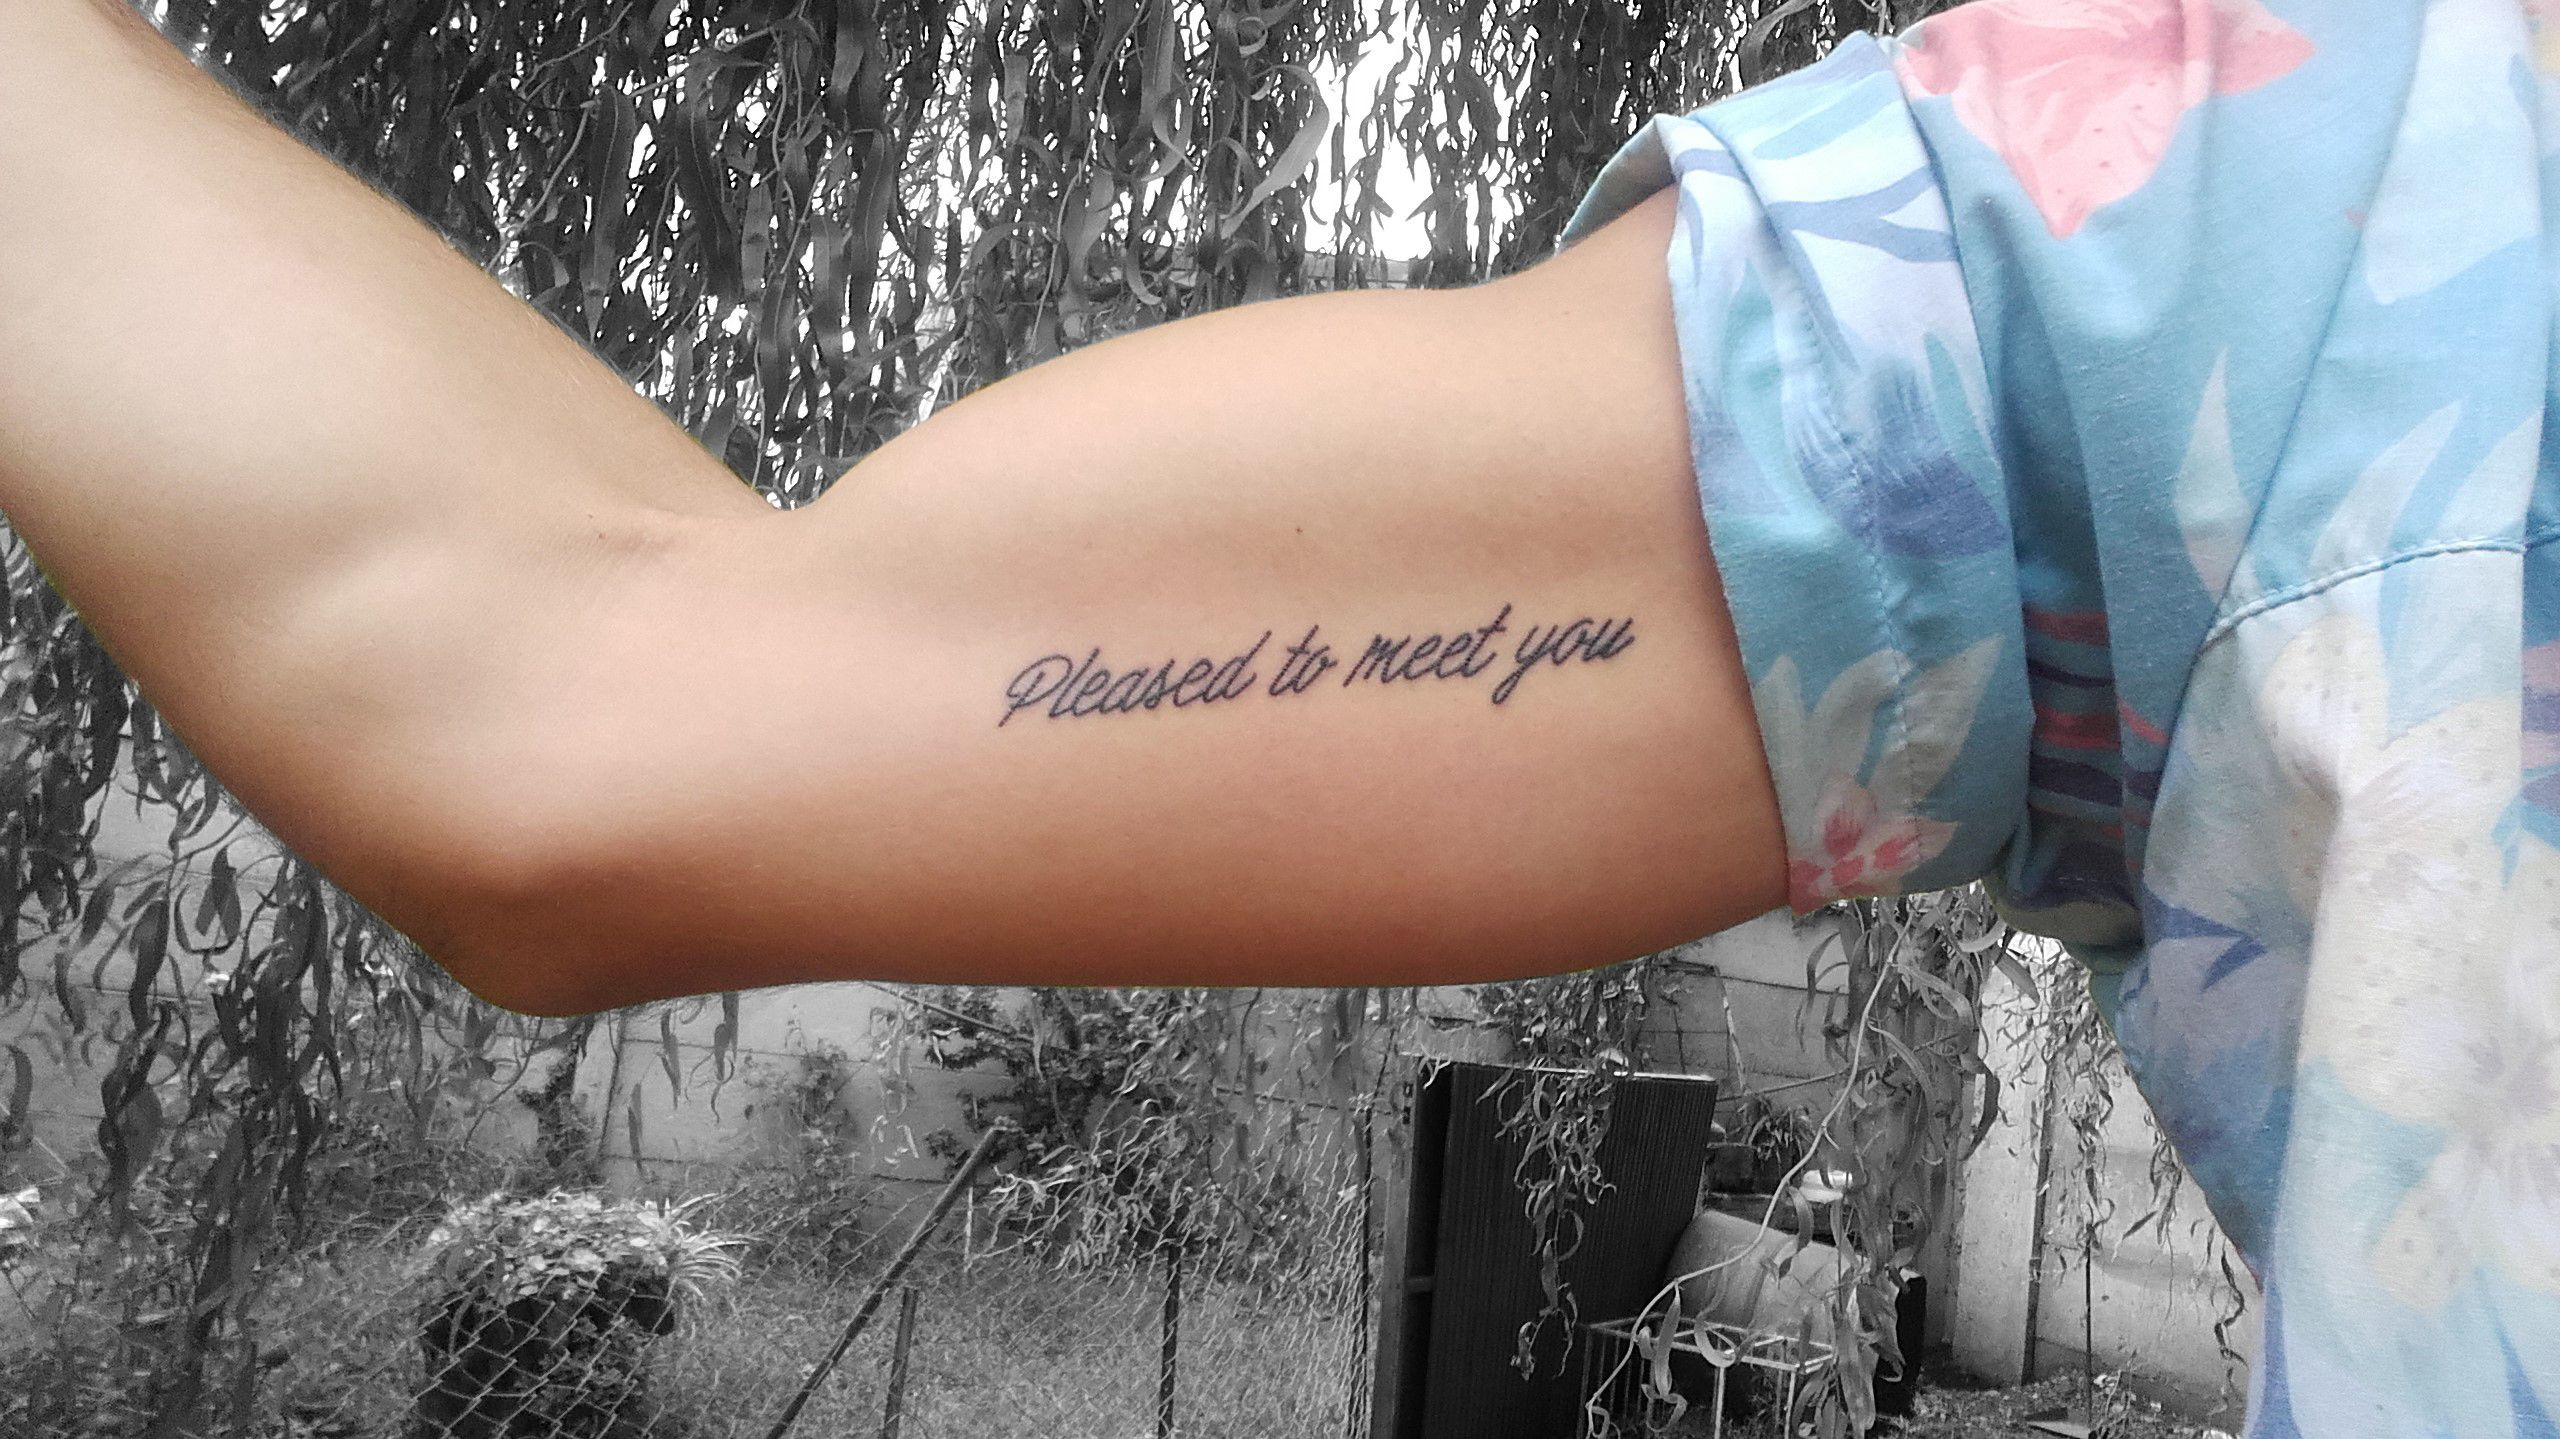 Inner bicep tattoo designs for men tatuaje en el brazo interior